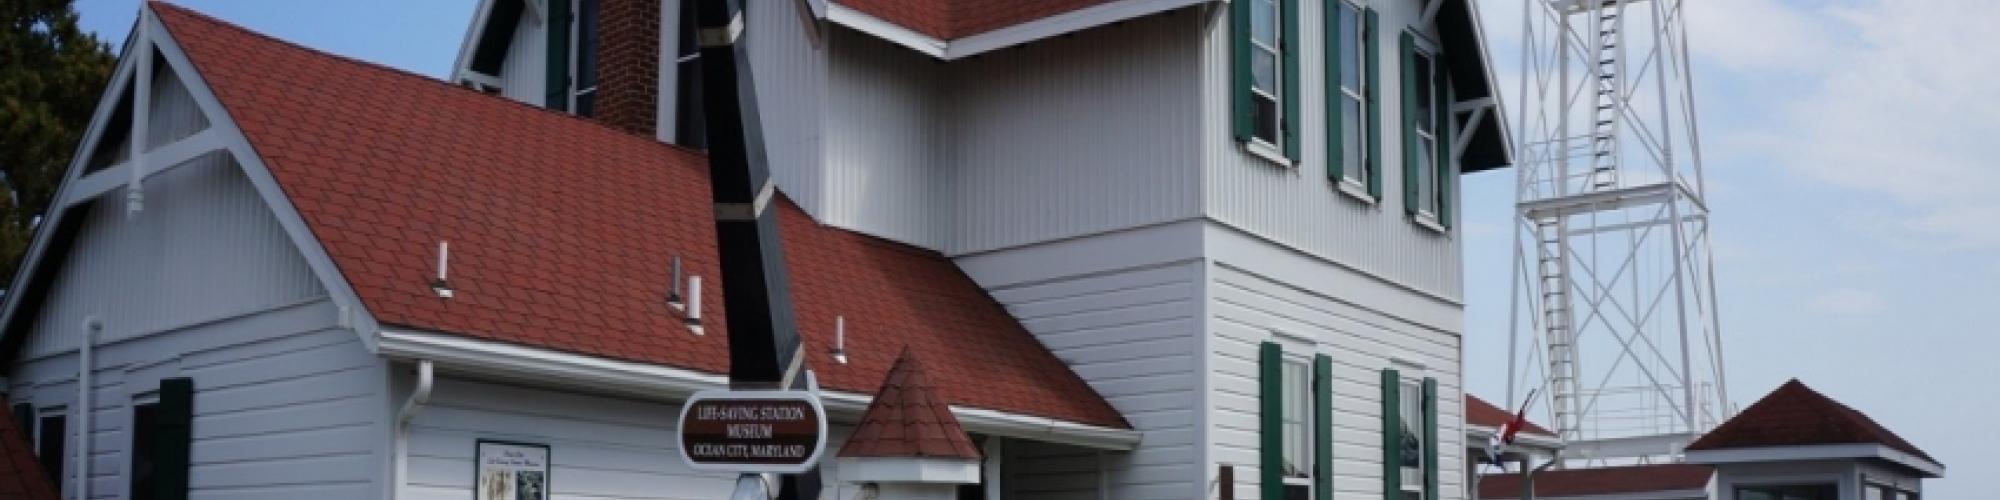 Museums Near Ocean City, MD